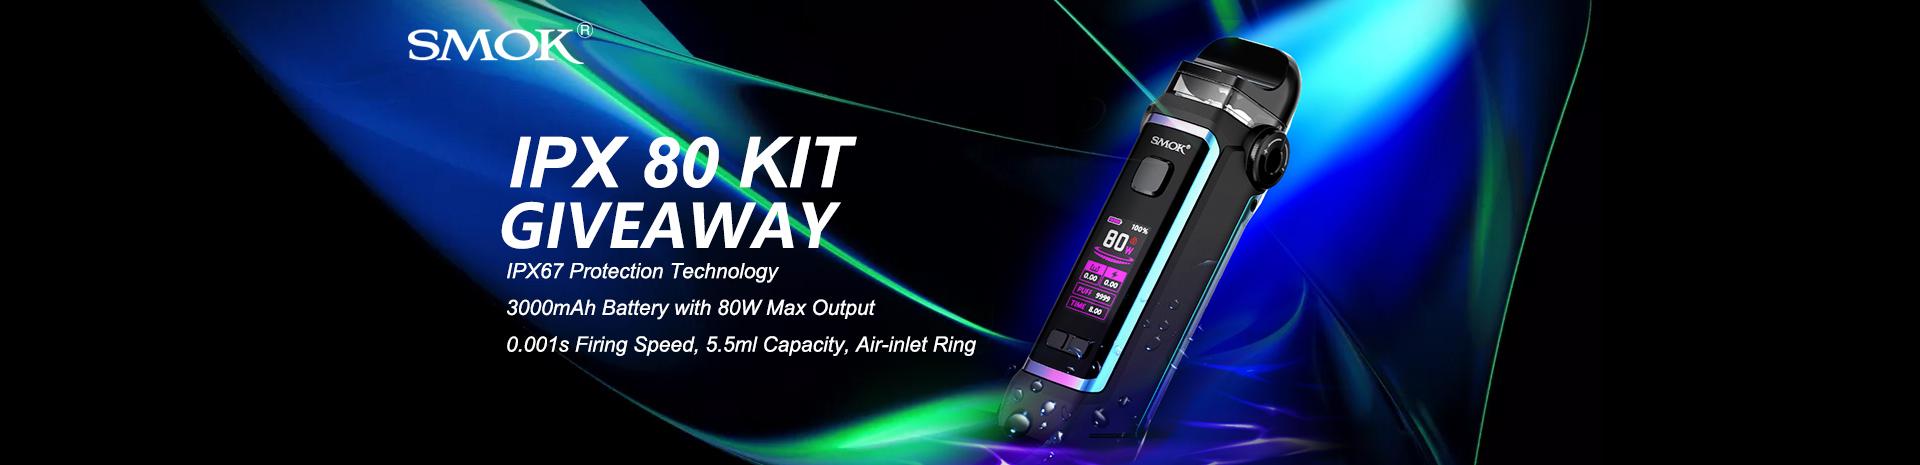 Smok IPX 80 Kit Giveaway Banner